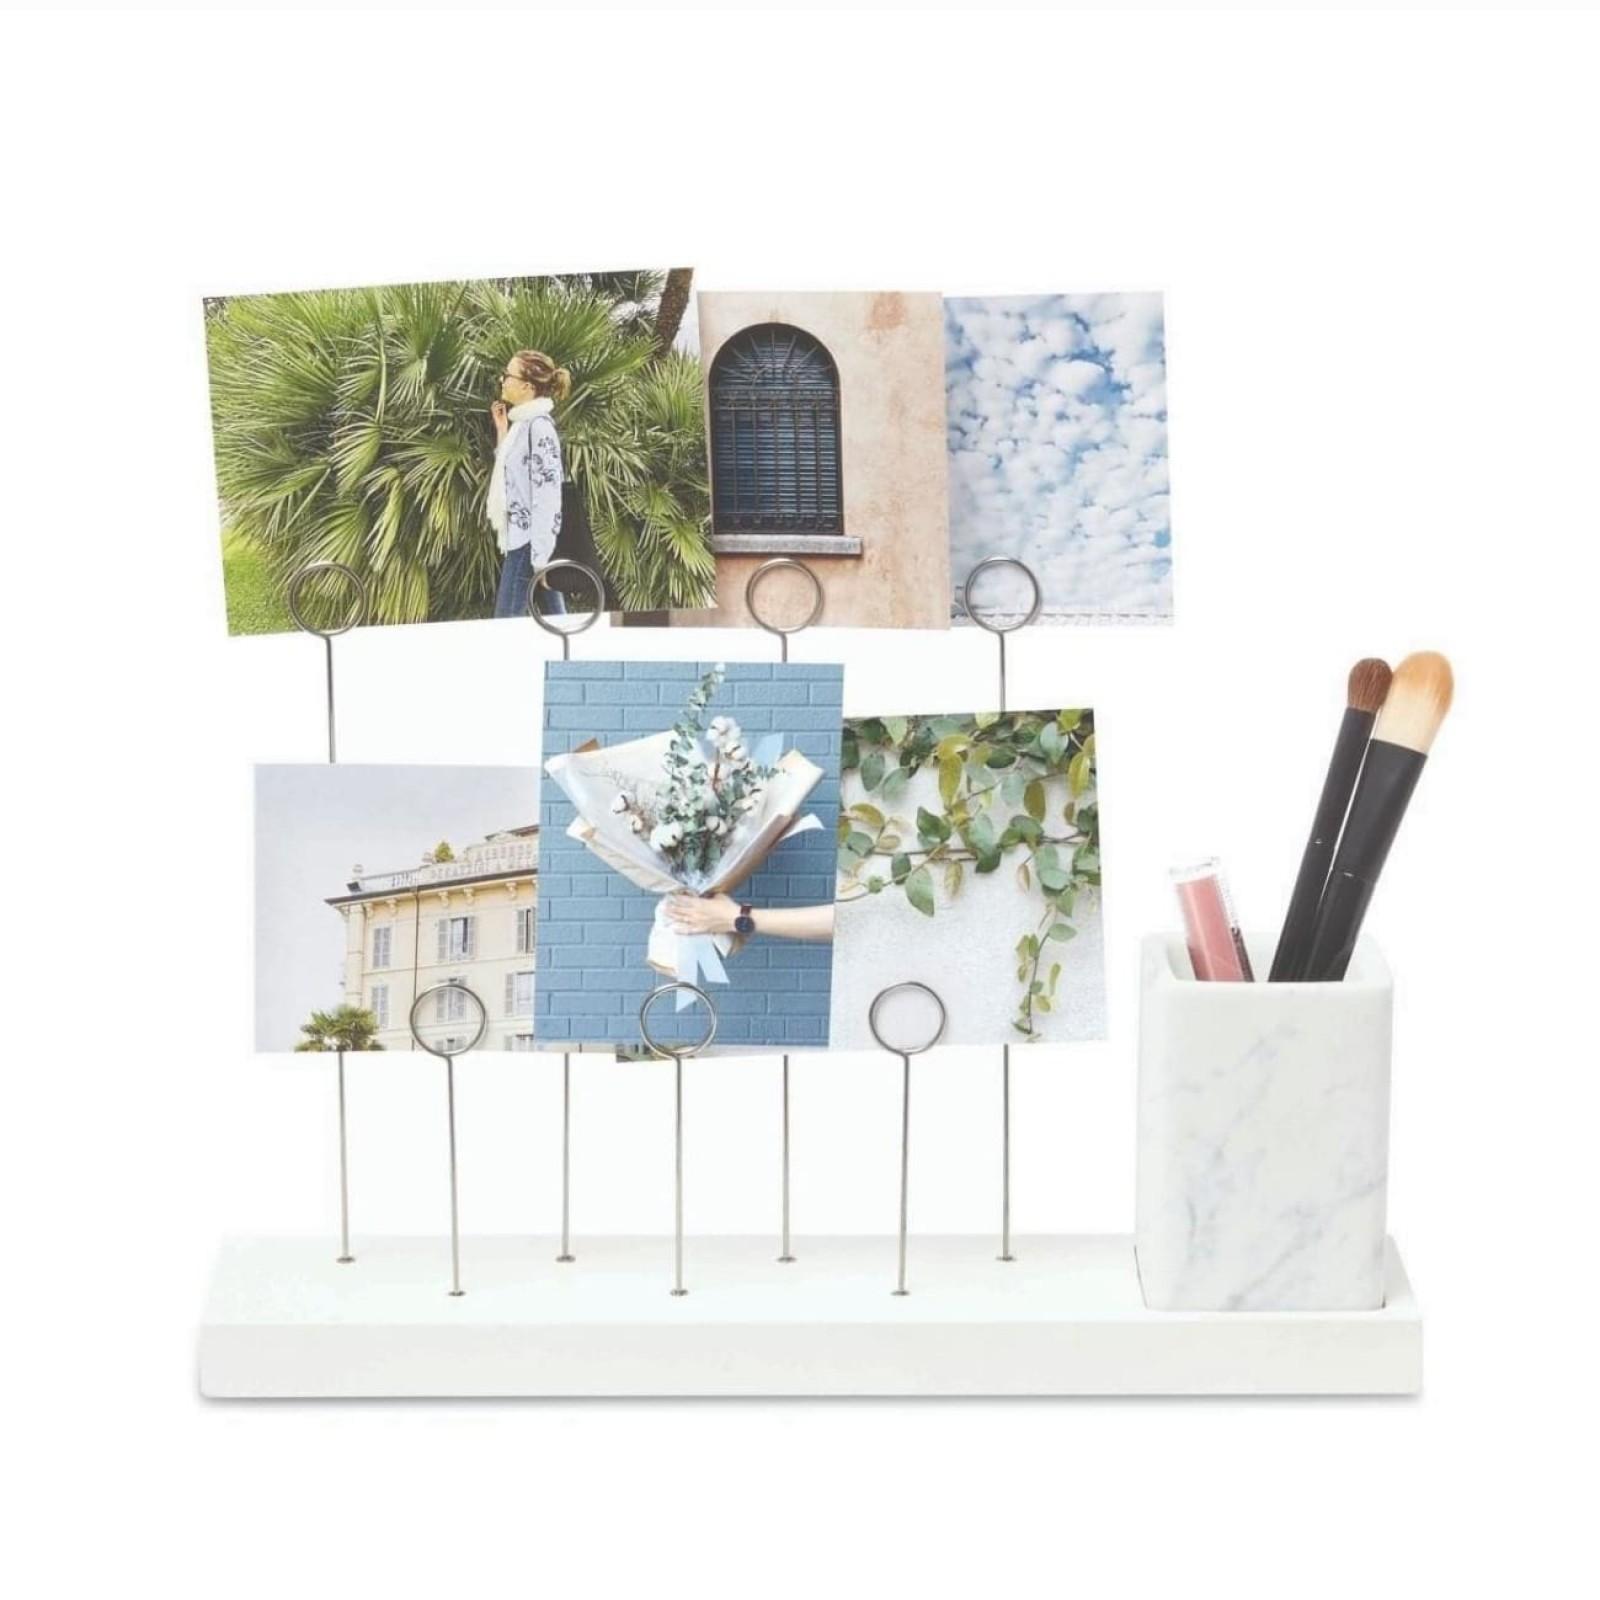 Gala Photo Display (White) - Umbra